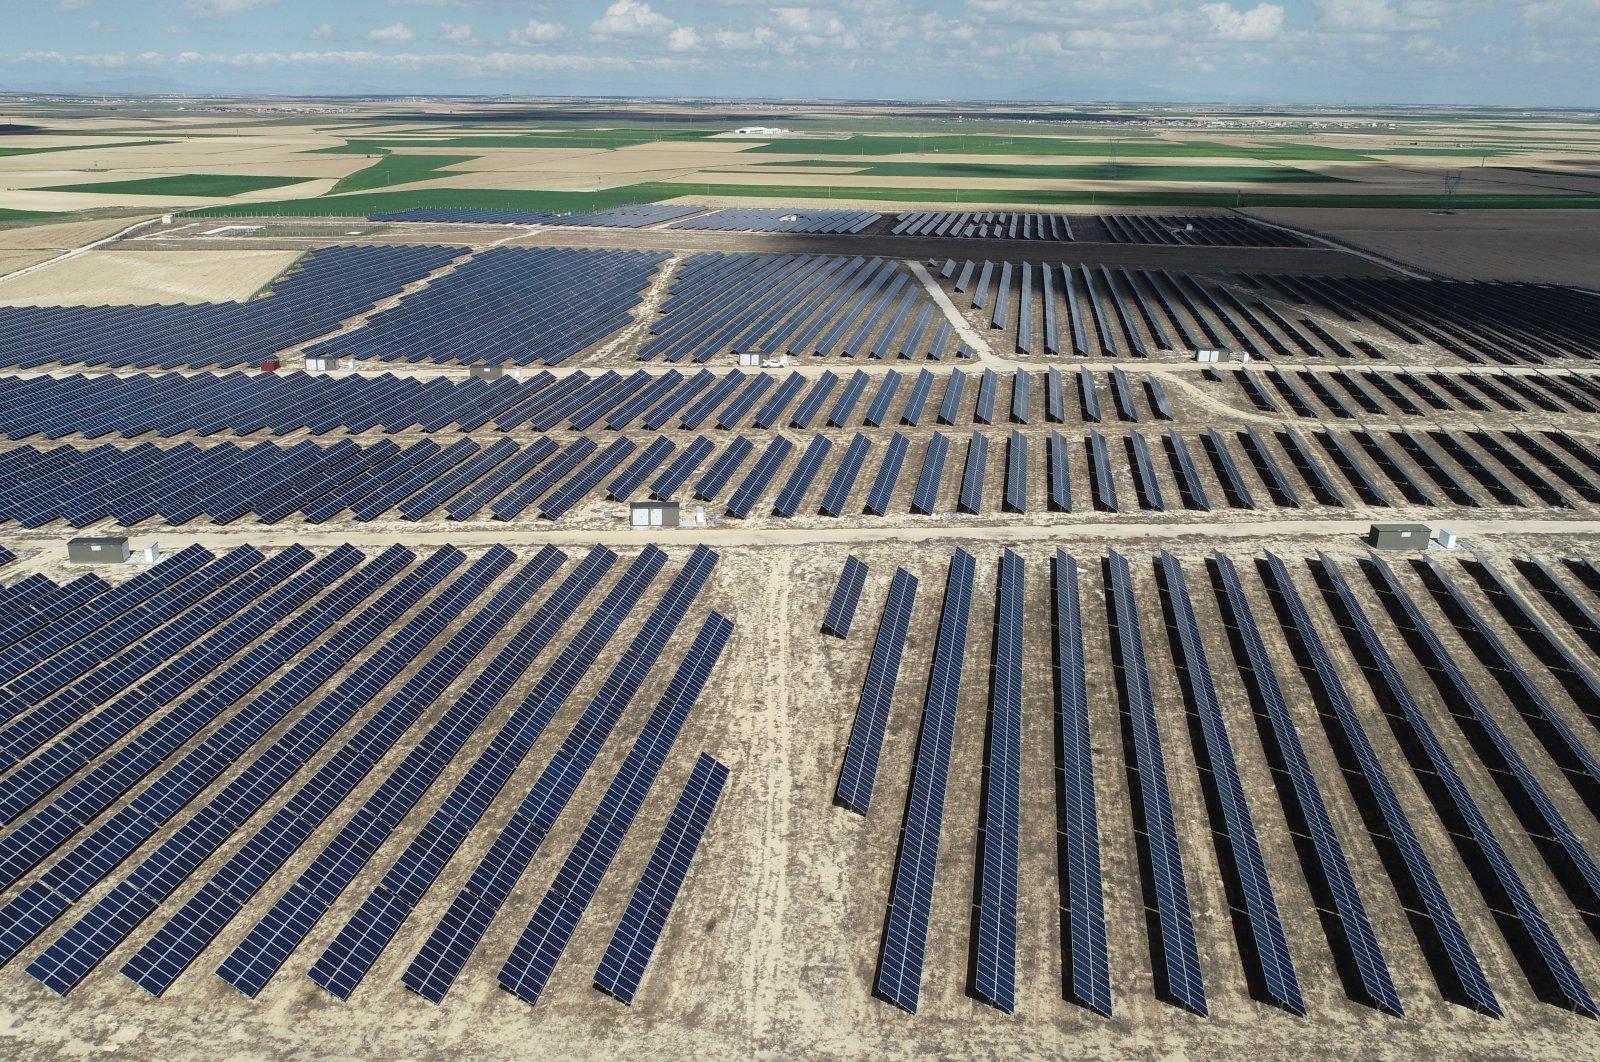 Solar panels are seenin the Karapınar district of the central Anatolian province of Konya, Turkey, May 6, 2020. (AA Photo)    ( Basir Gülüm - Anadolu Ajansı )